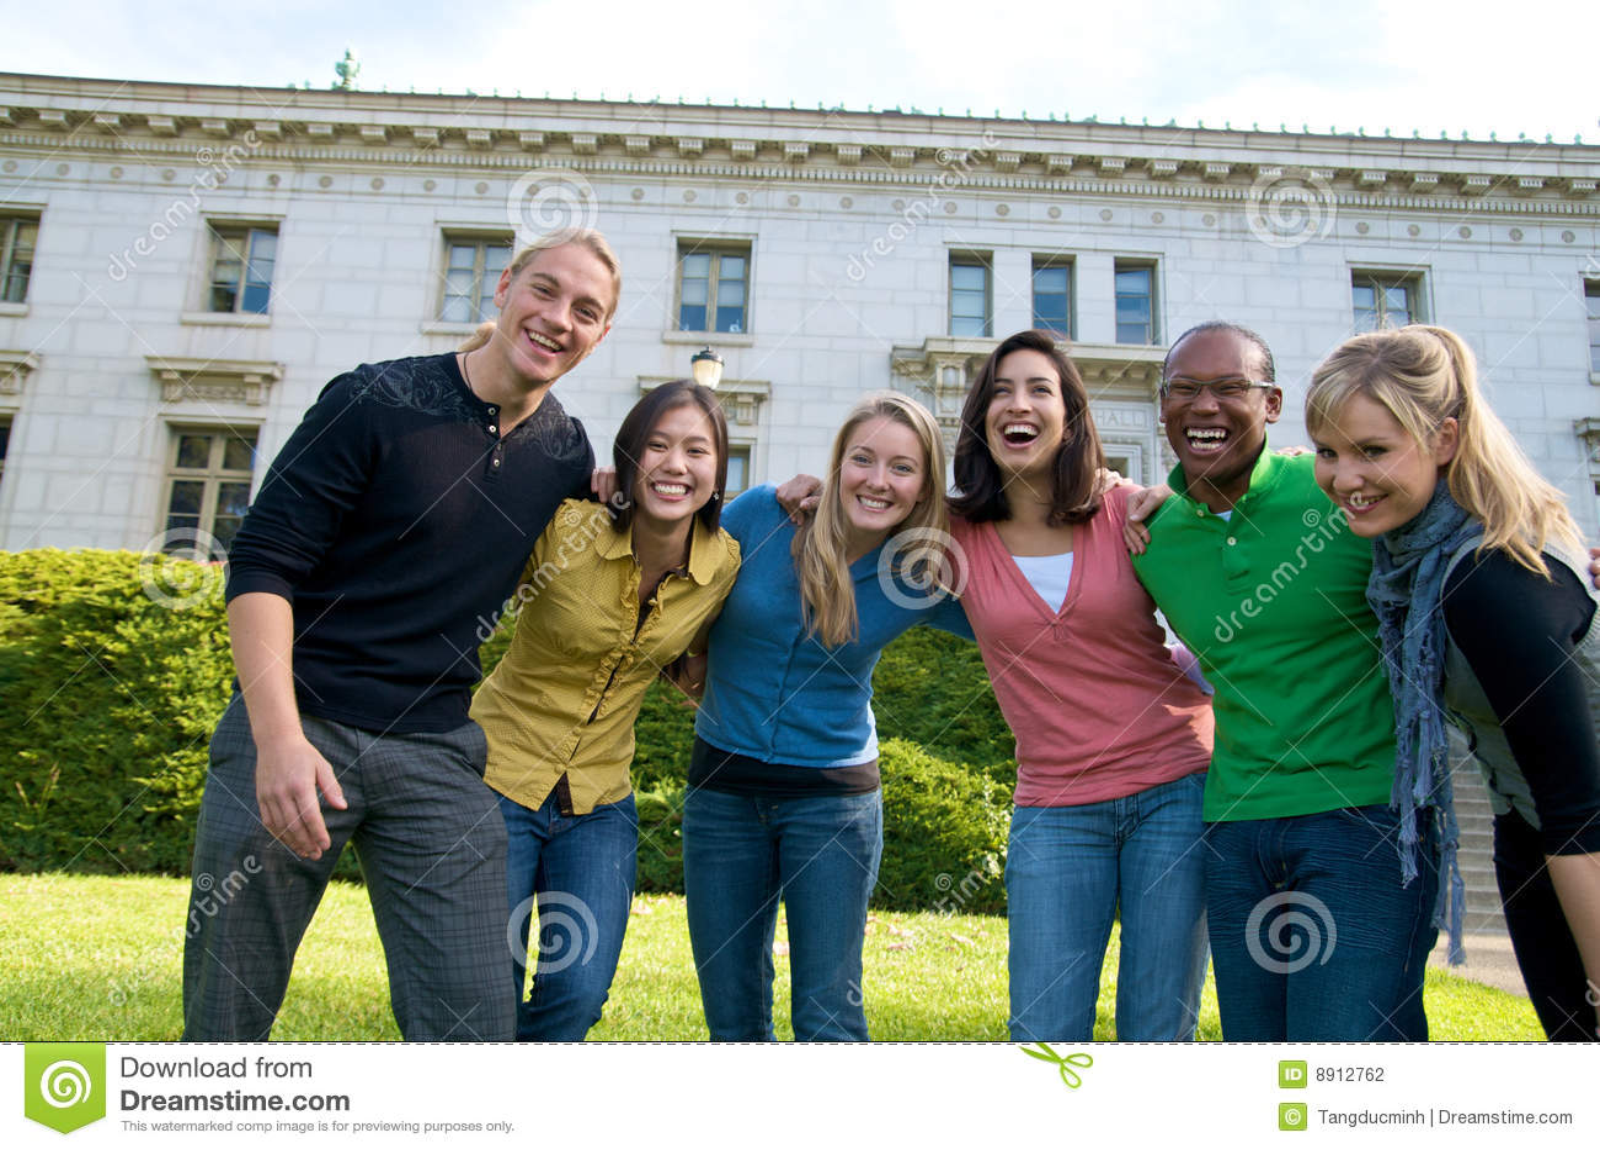 campus diversity [keyword]